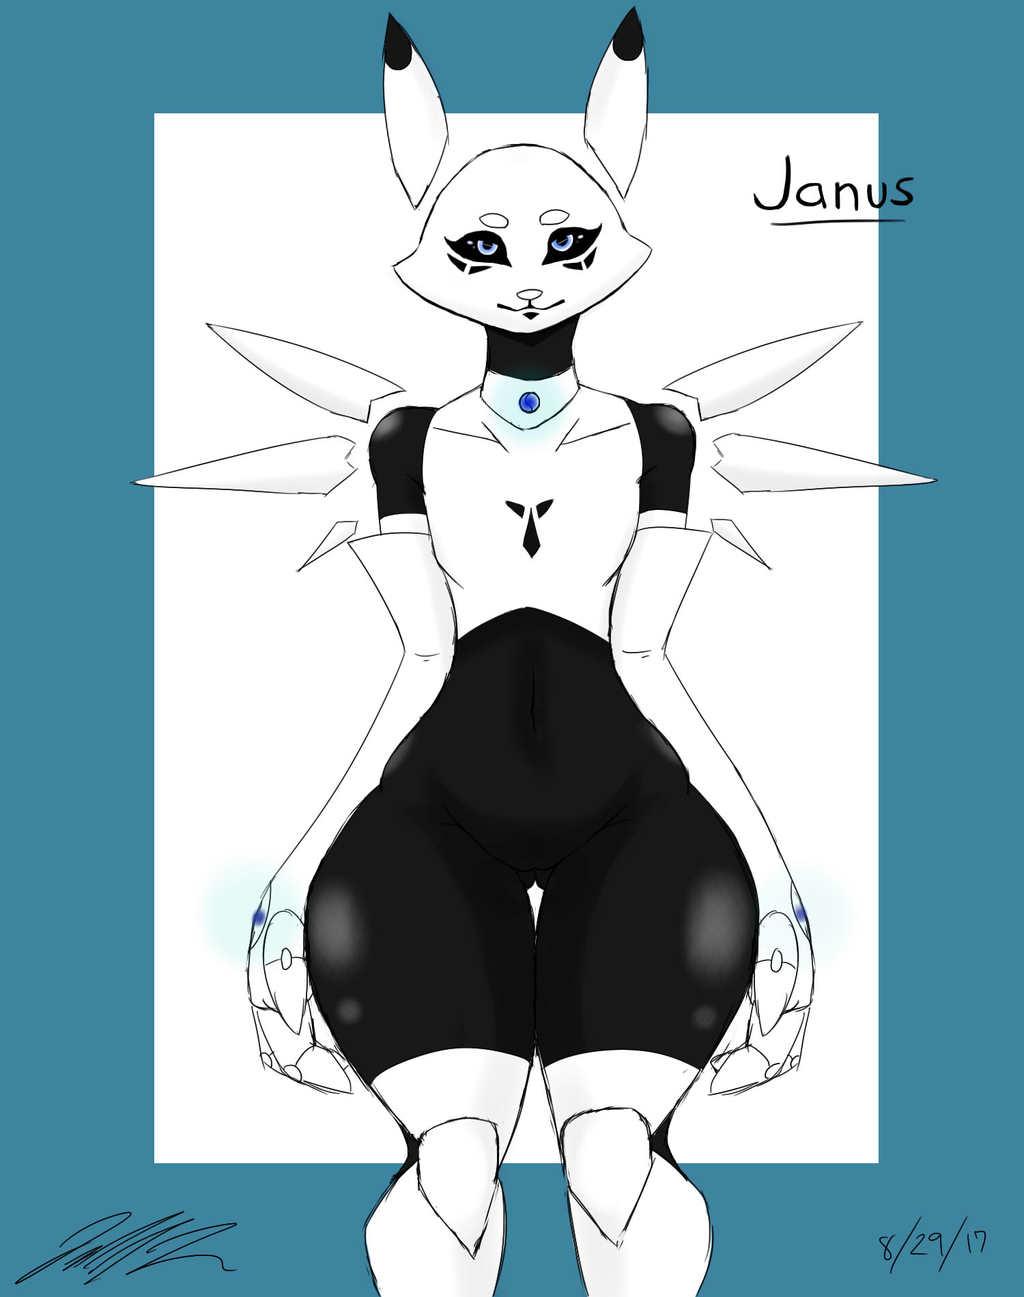 Most recent image: Janus The Robo-Renamon